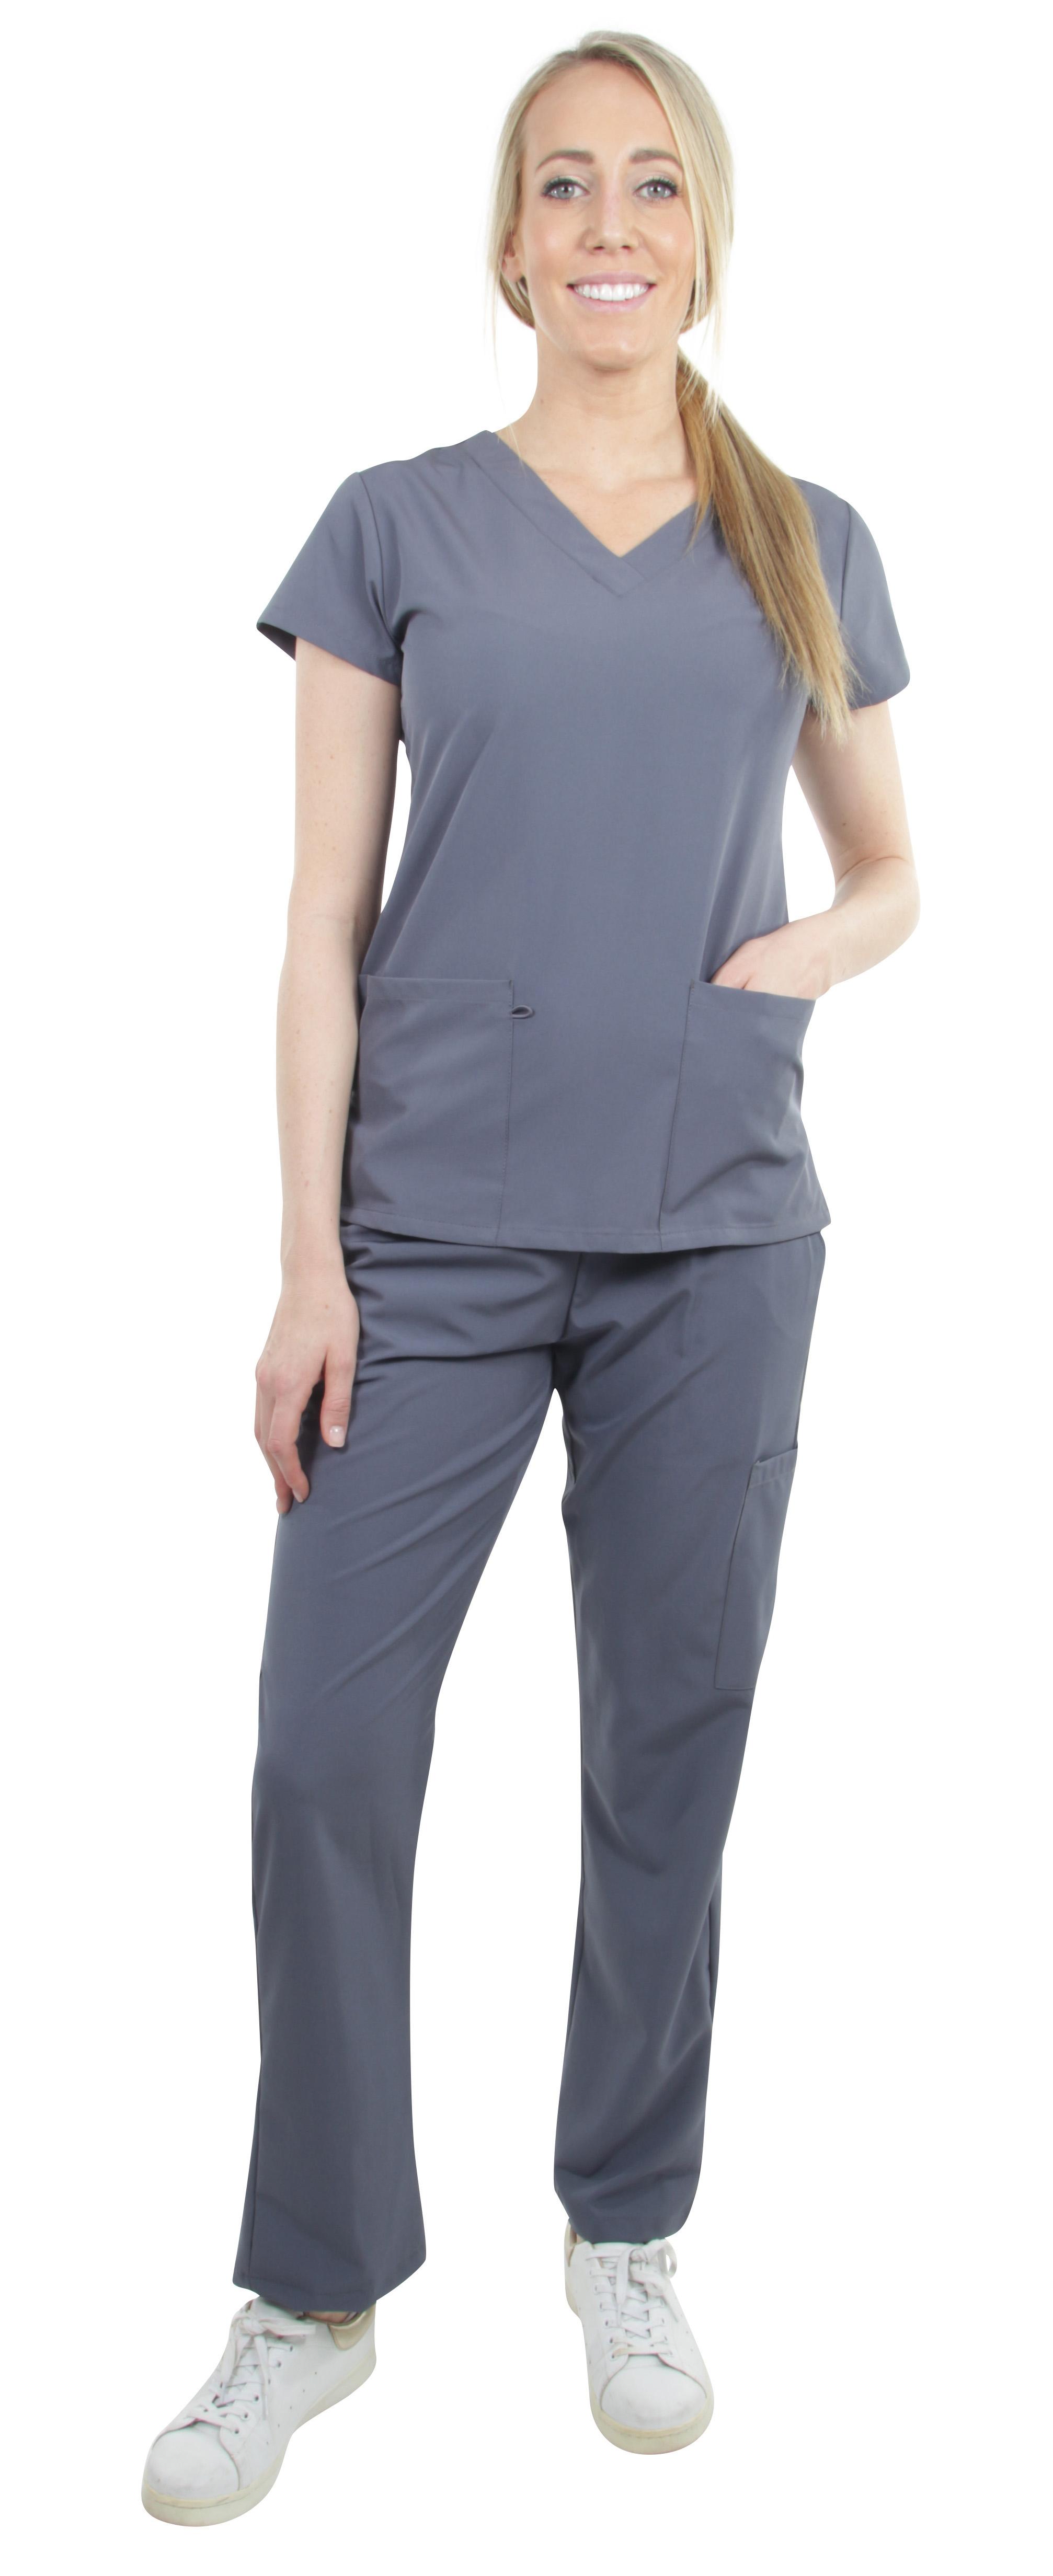 Unisex-Performance-Stretch-Medical-Uniform-Five-Pockets-V-Neck-Scrubs-Sets miniature 30